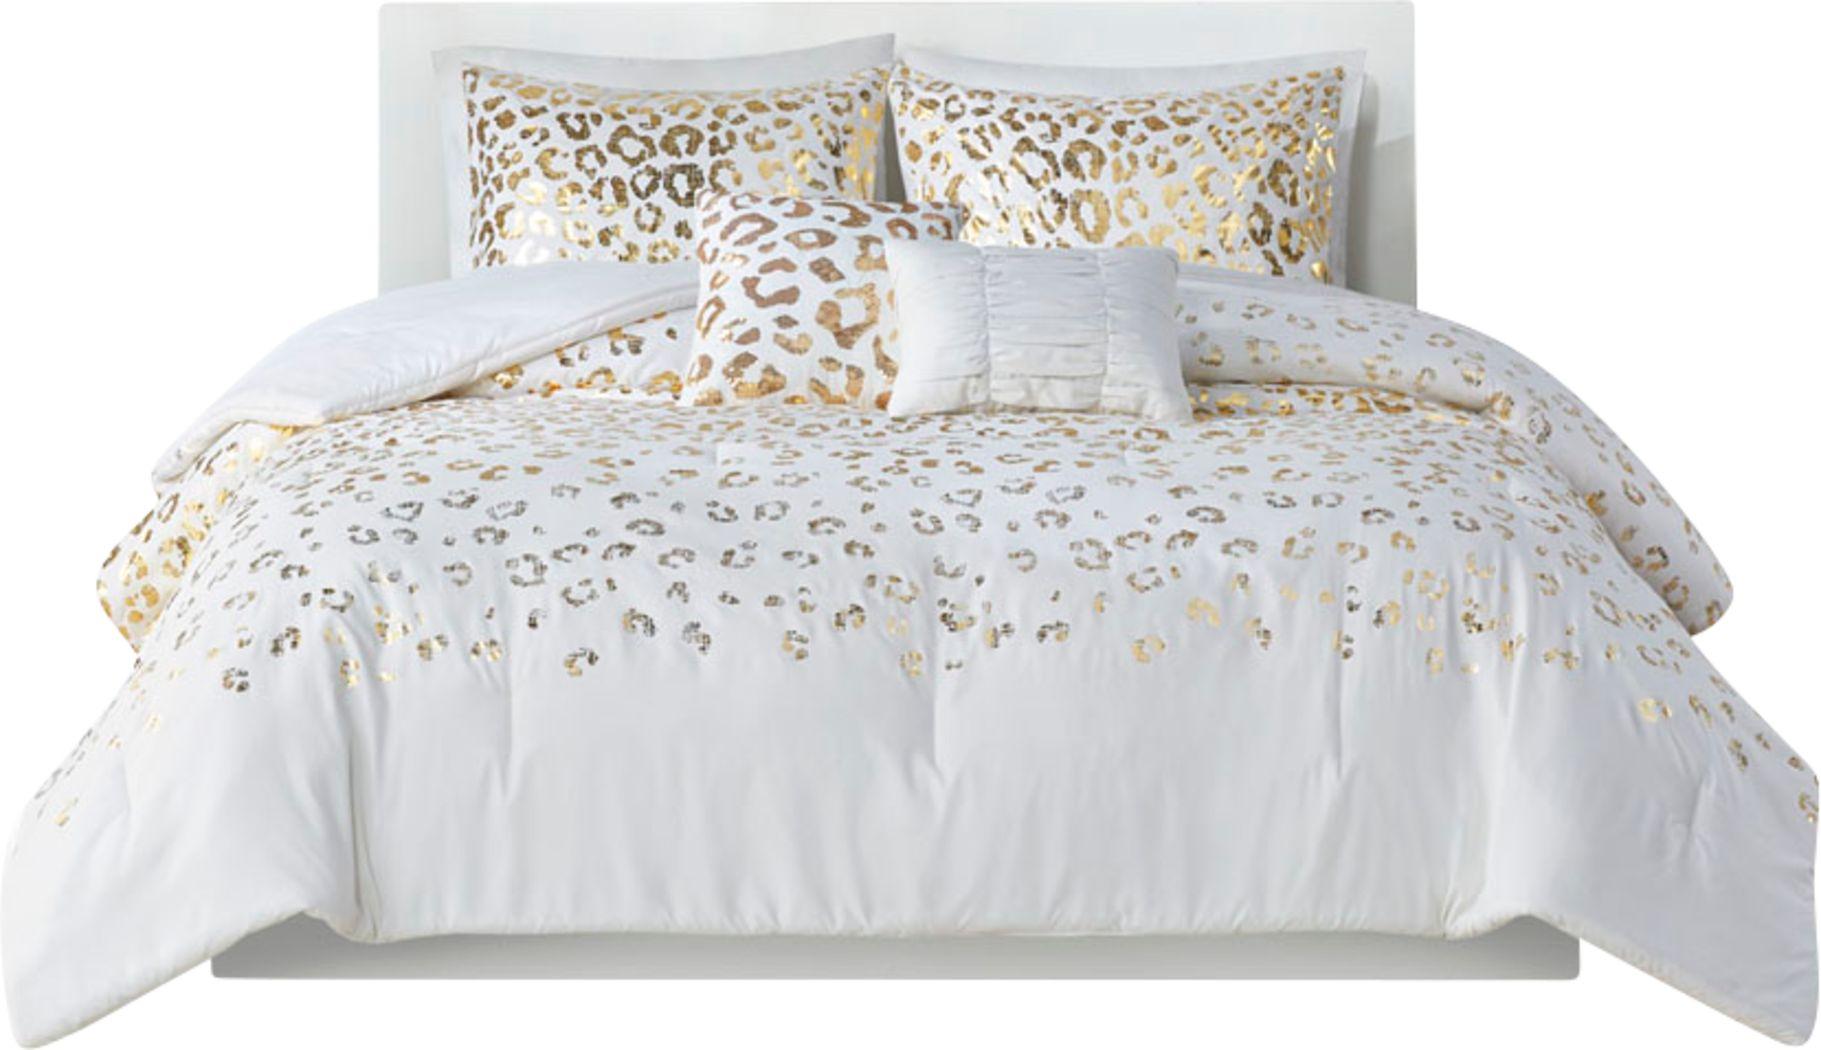 Kids Leopard Chic Ivory 4 Pc Twin XL Comforter Set